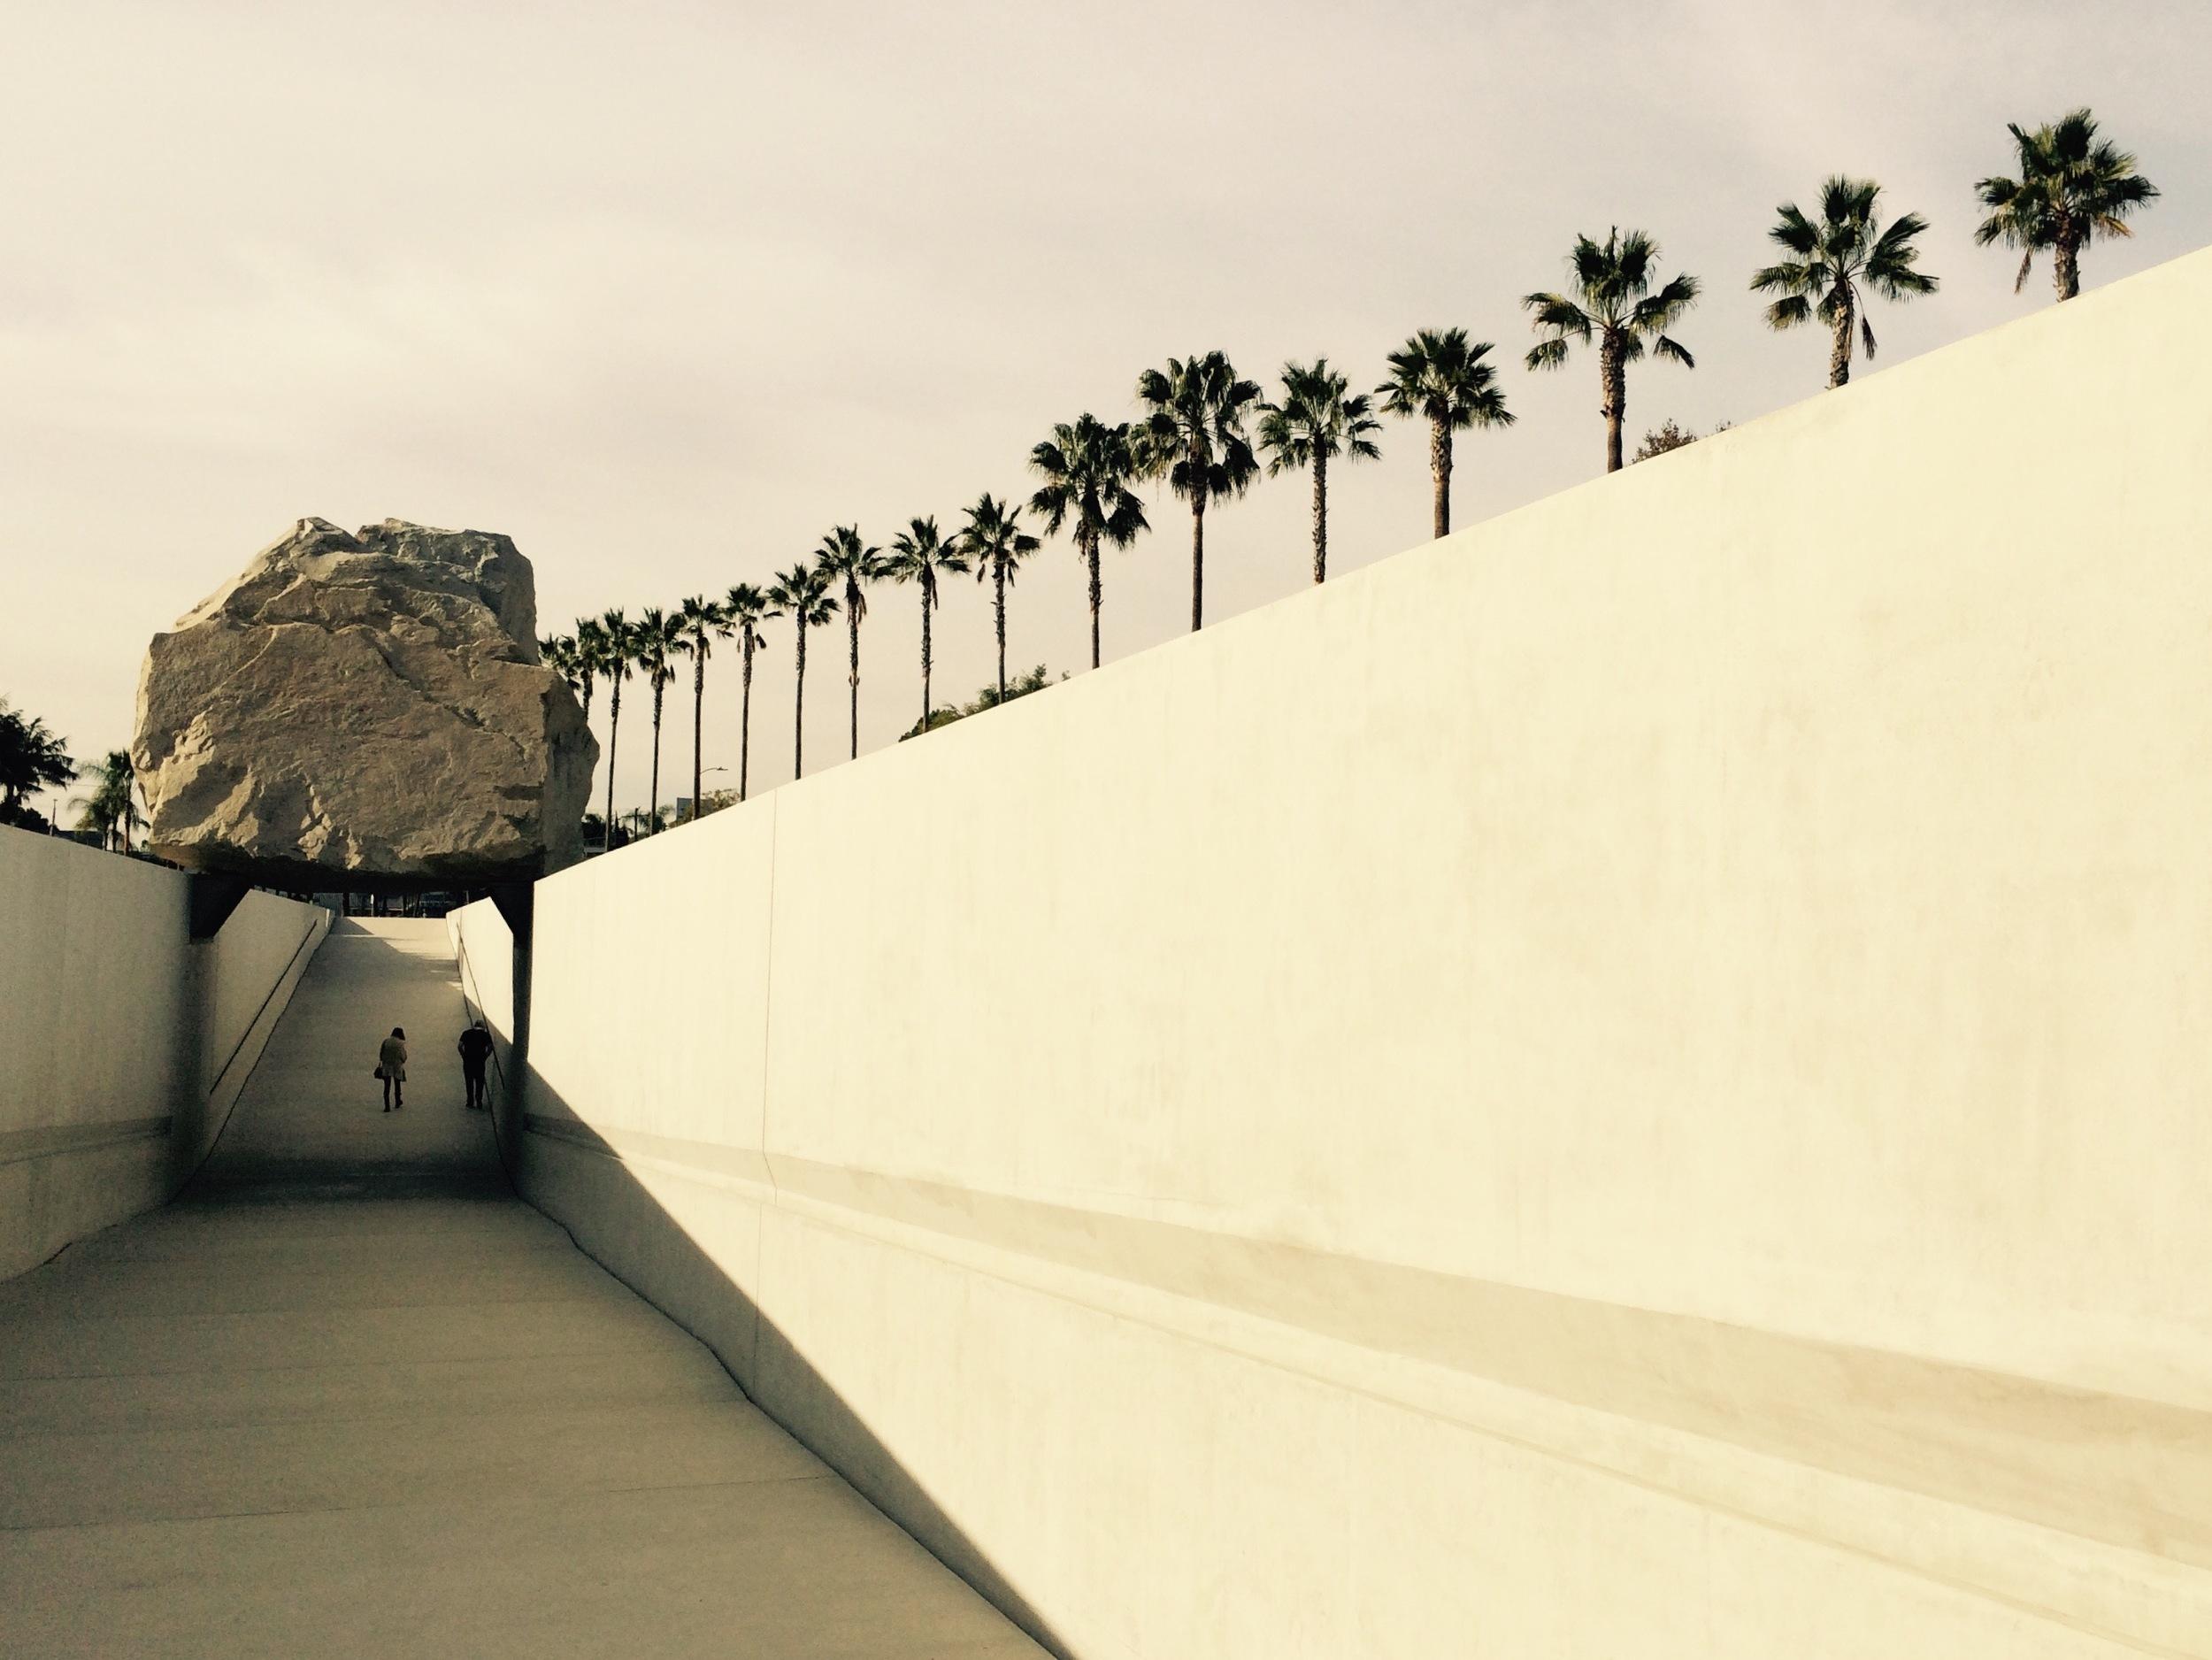 LACMA museum, Los Angeles - 3 Days*